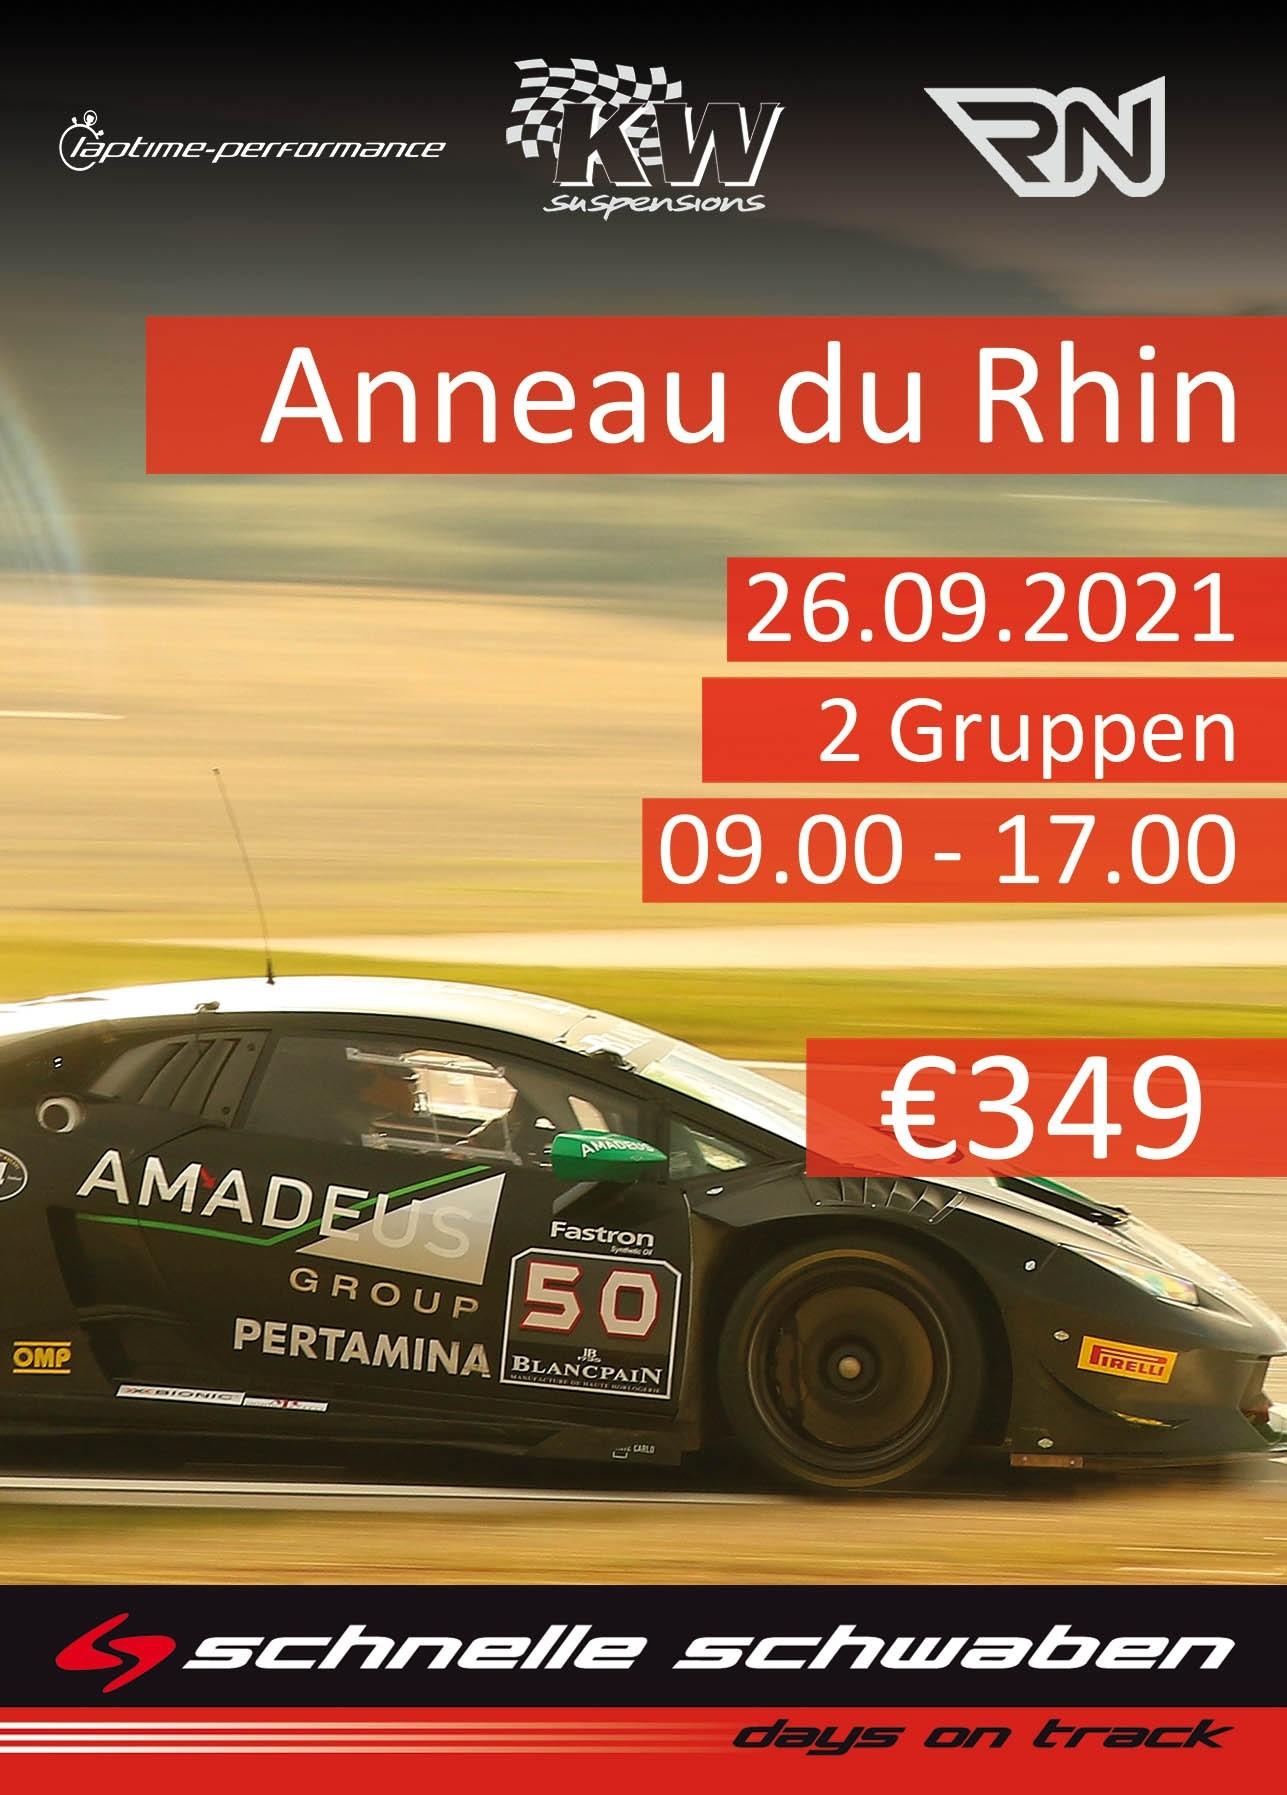 Anneau du Rhin Training 26.9.2021